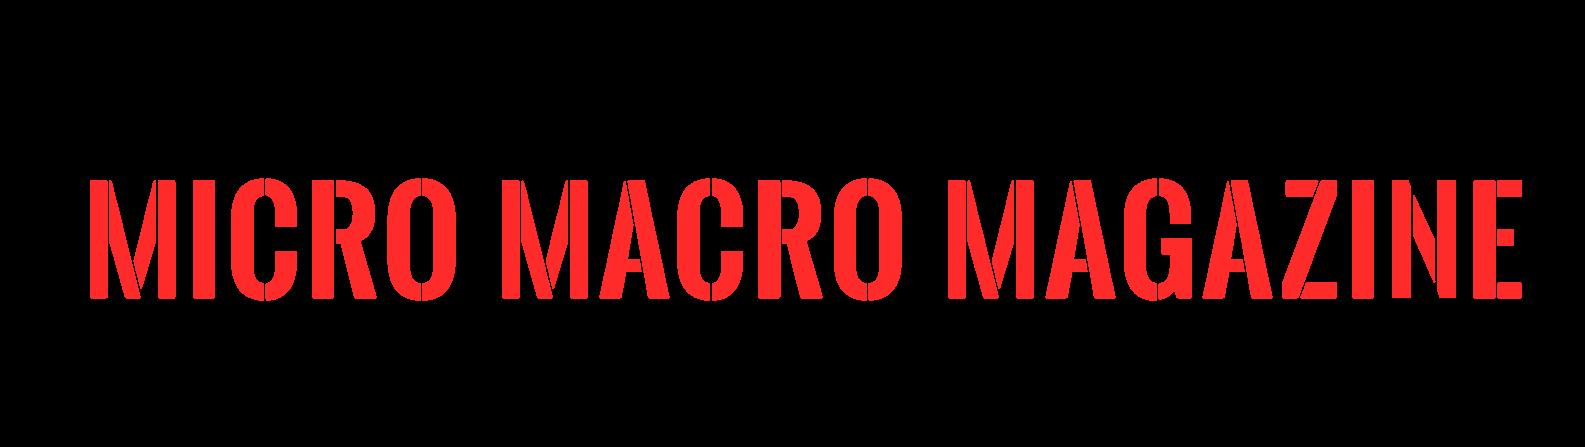 Micro Macro Magazine